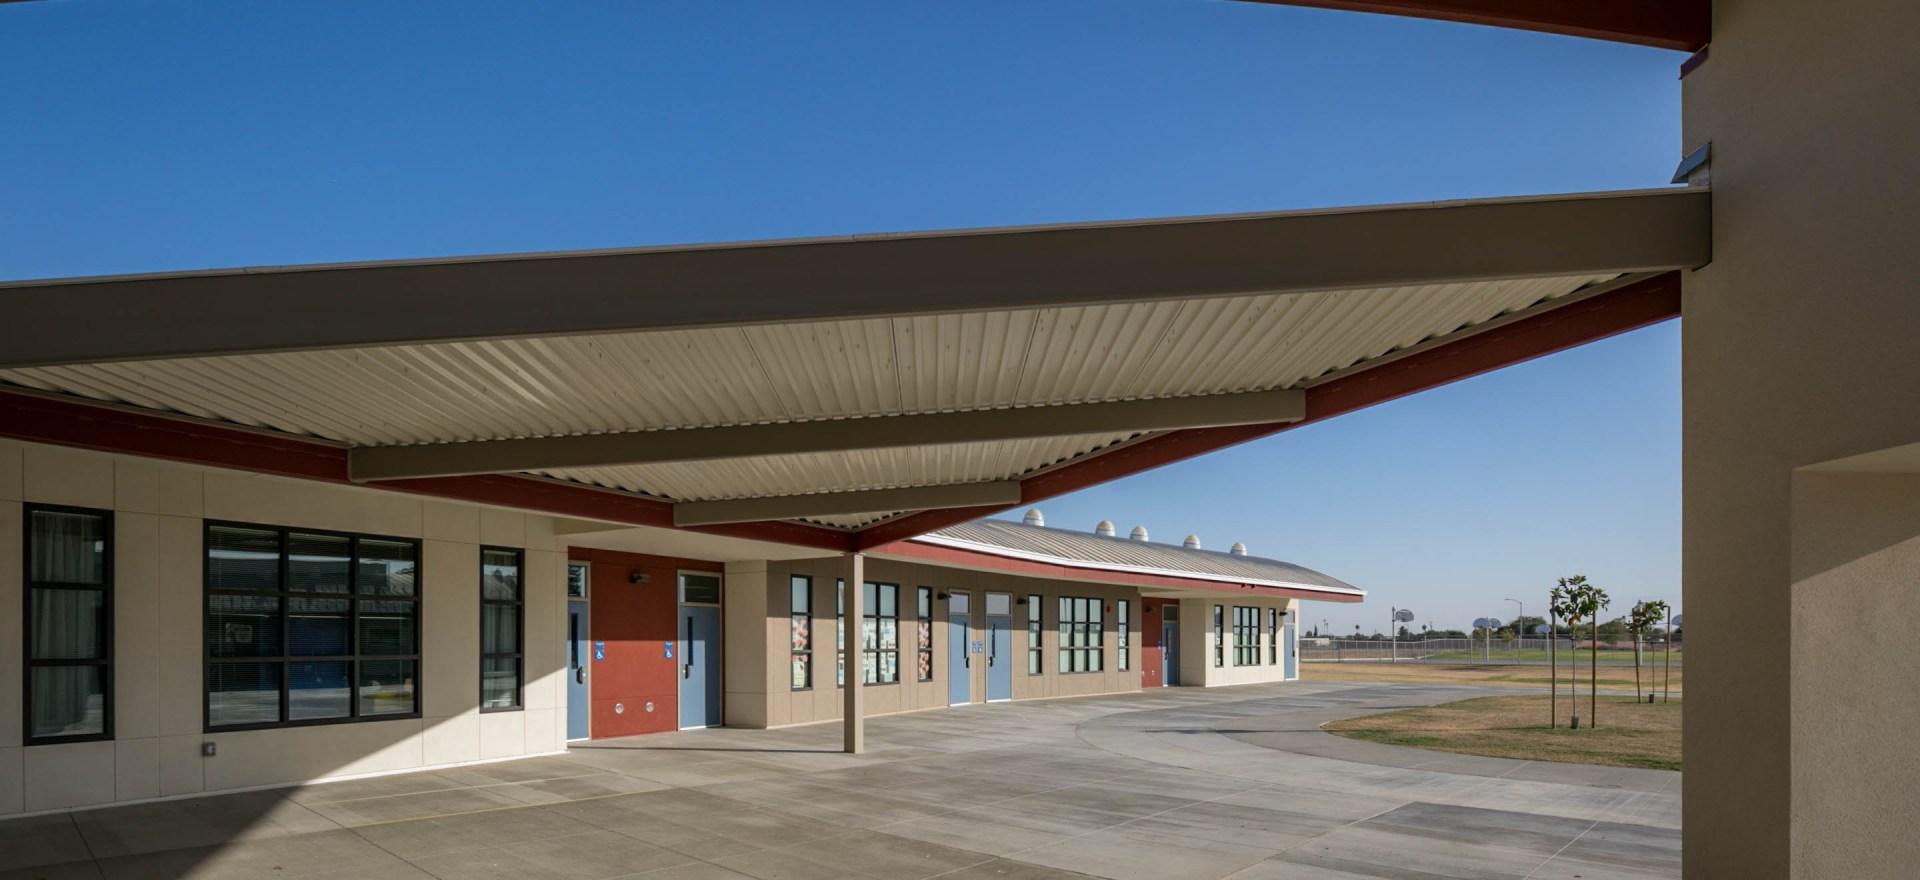 JTSModular-WhitleyElementarySchool-RobRijnenPhotography (12 of 36)